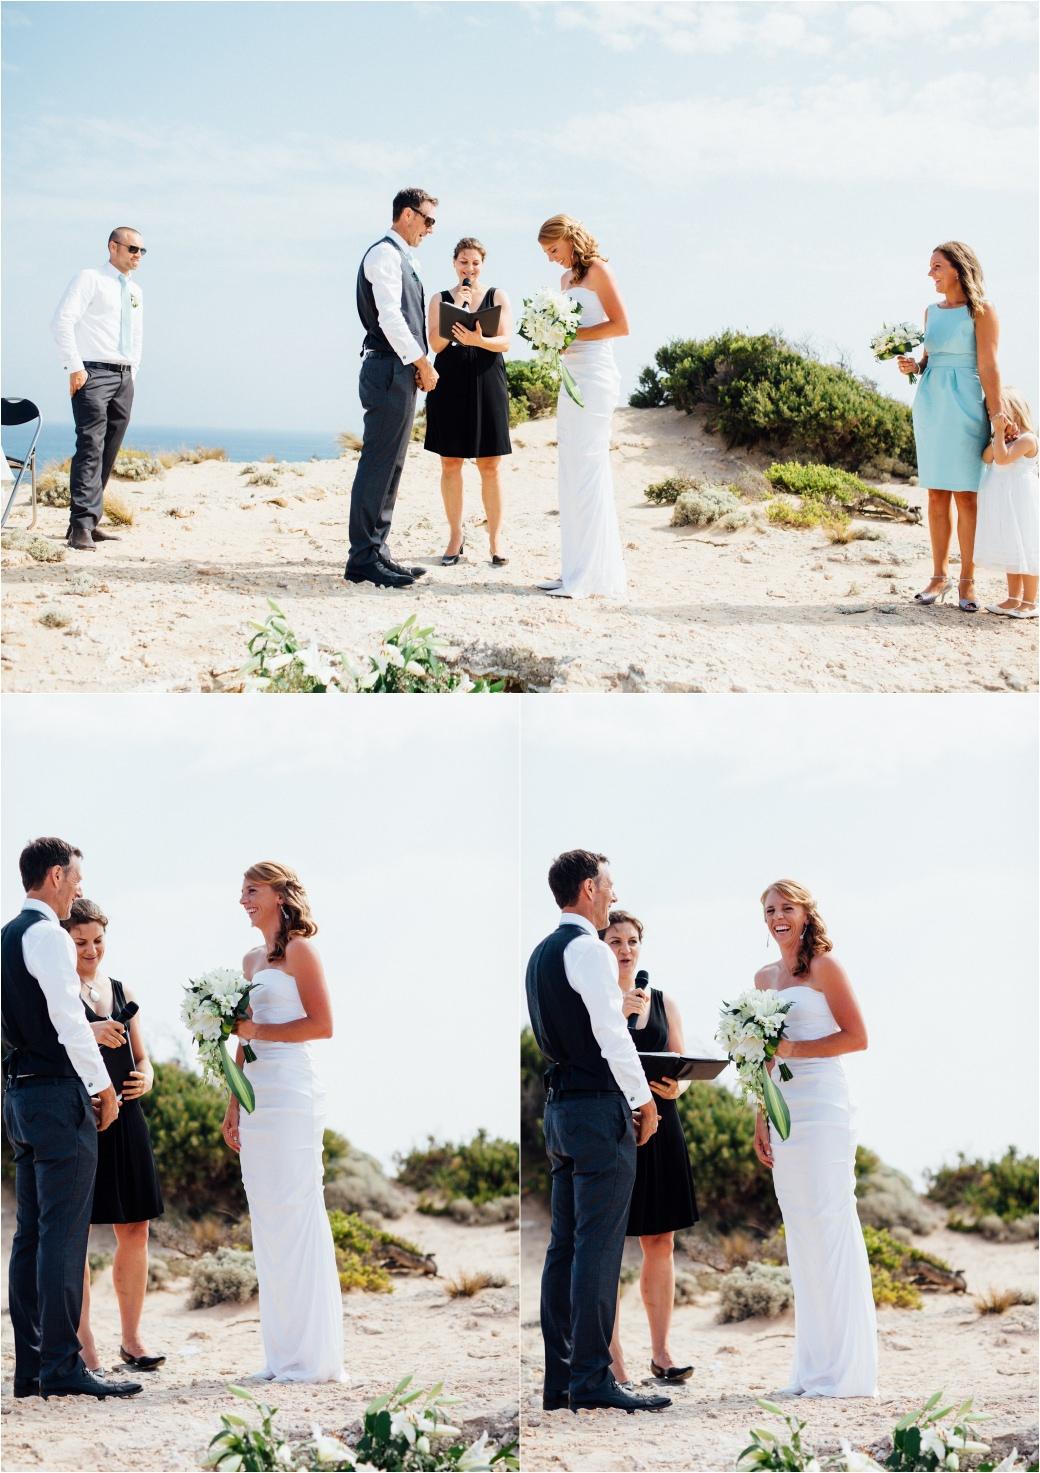 hanwin triathlon taco truck sorrento australian beach witsup wedding day melbourne wedding hyggelig photography037